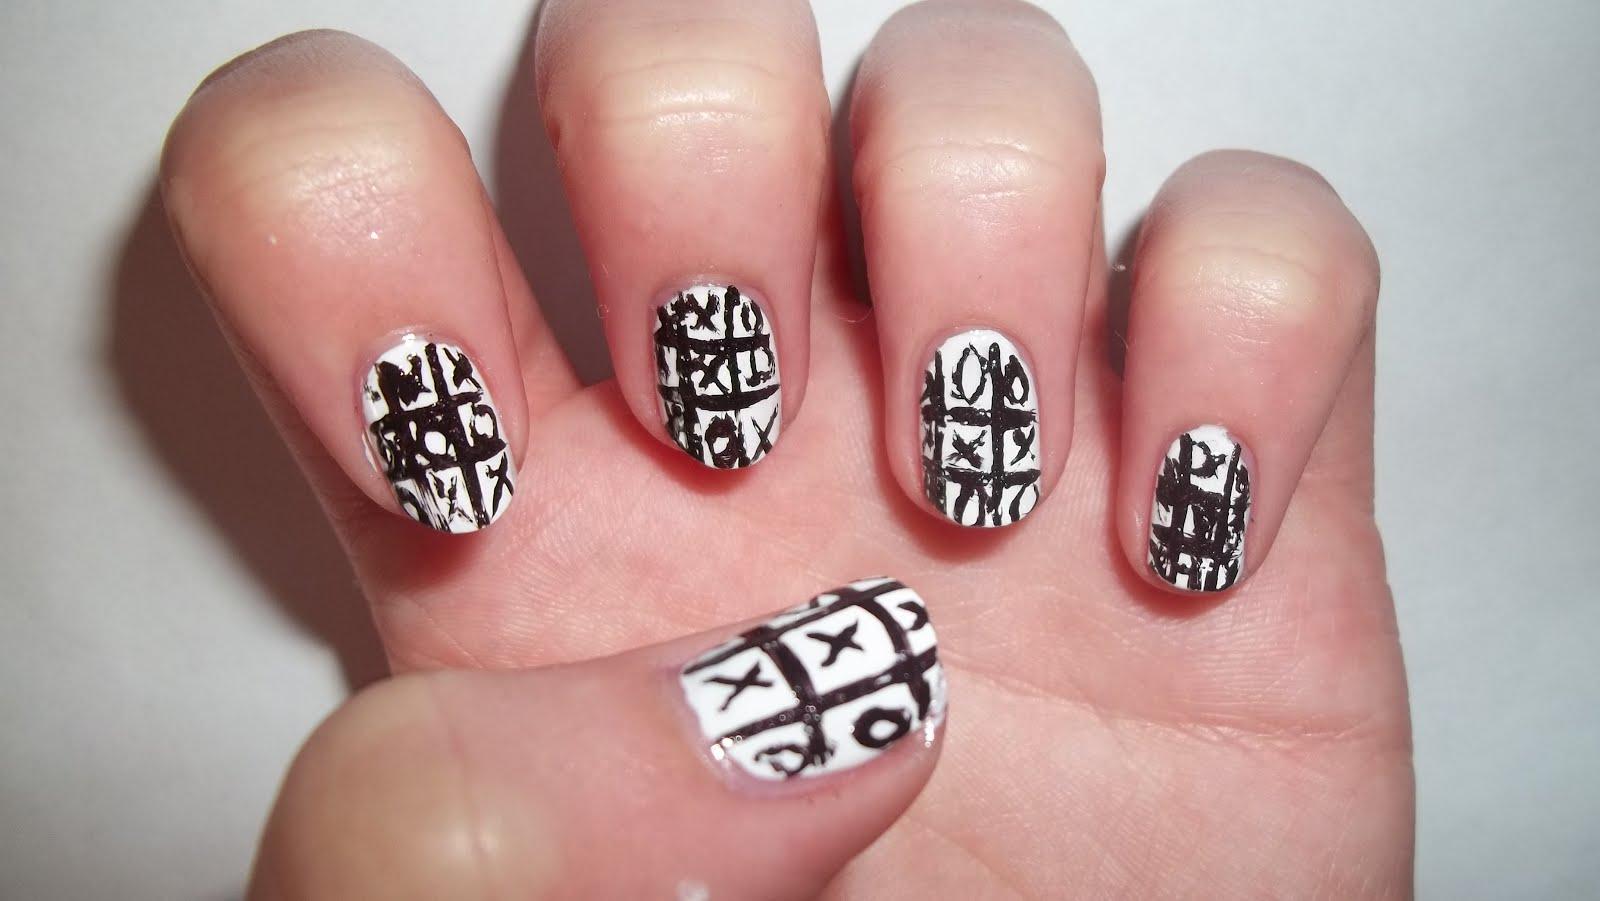 White Toe Nail Designs Tumblr Blue and White Cute Toe Nail Design ...